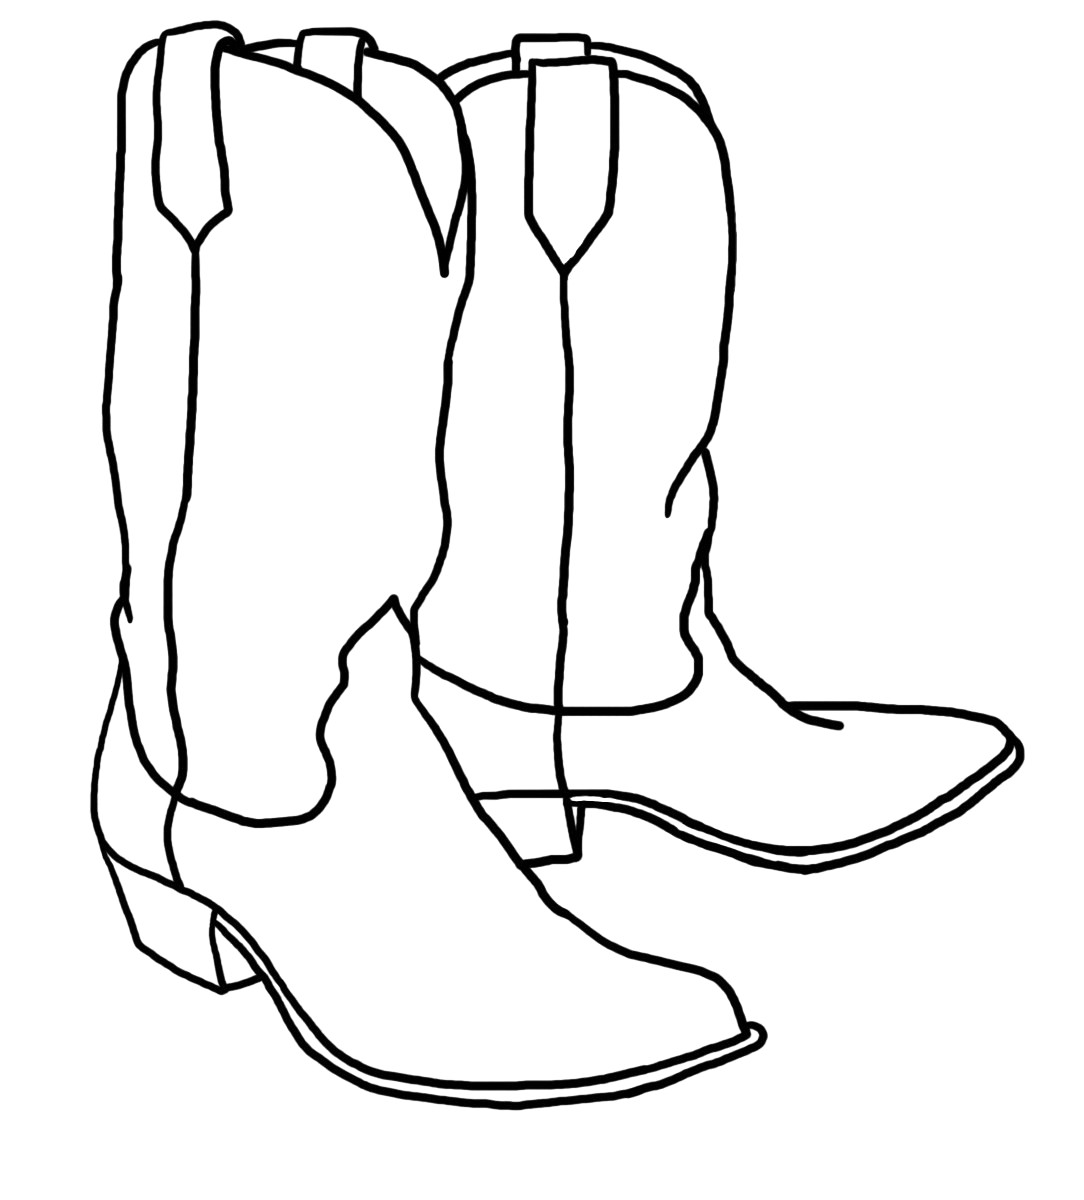 Cowboy Boots Drawing.